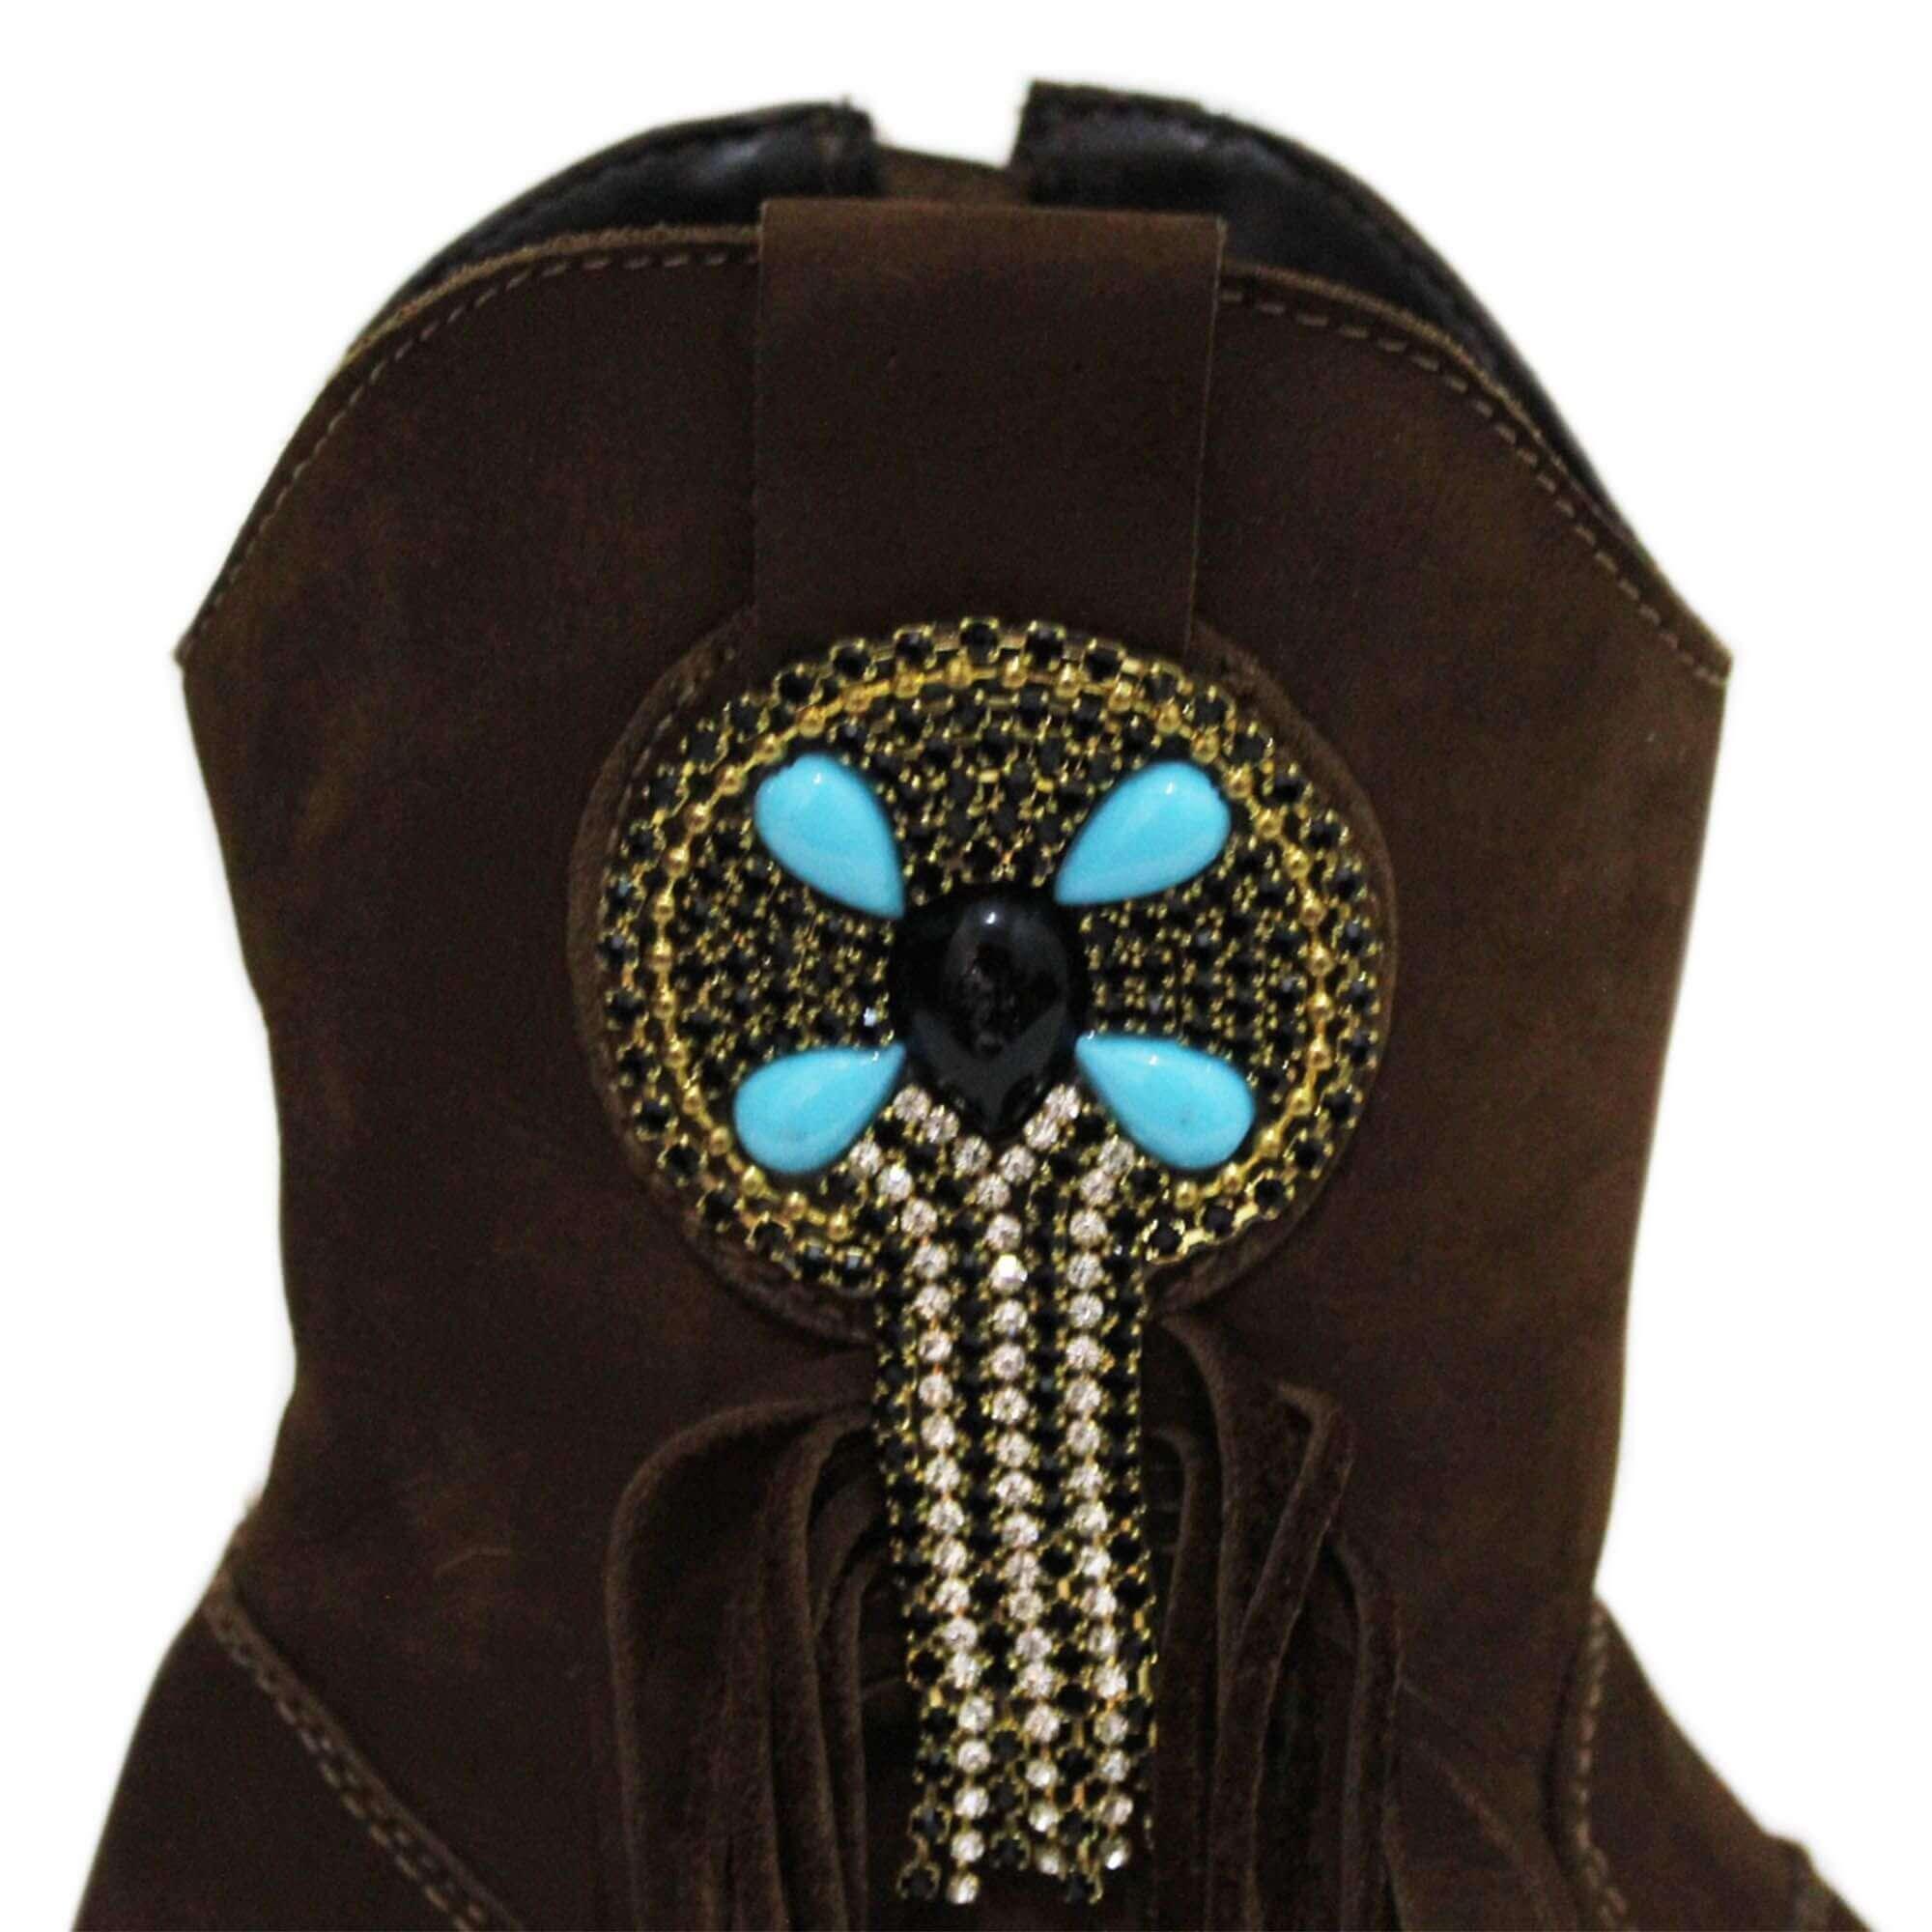 Bota Vimar Boots Feminina Nobuck Taupe